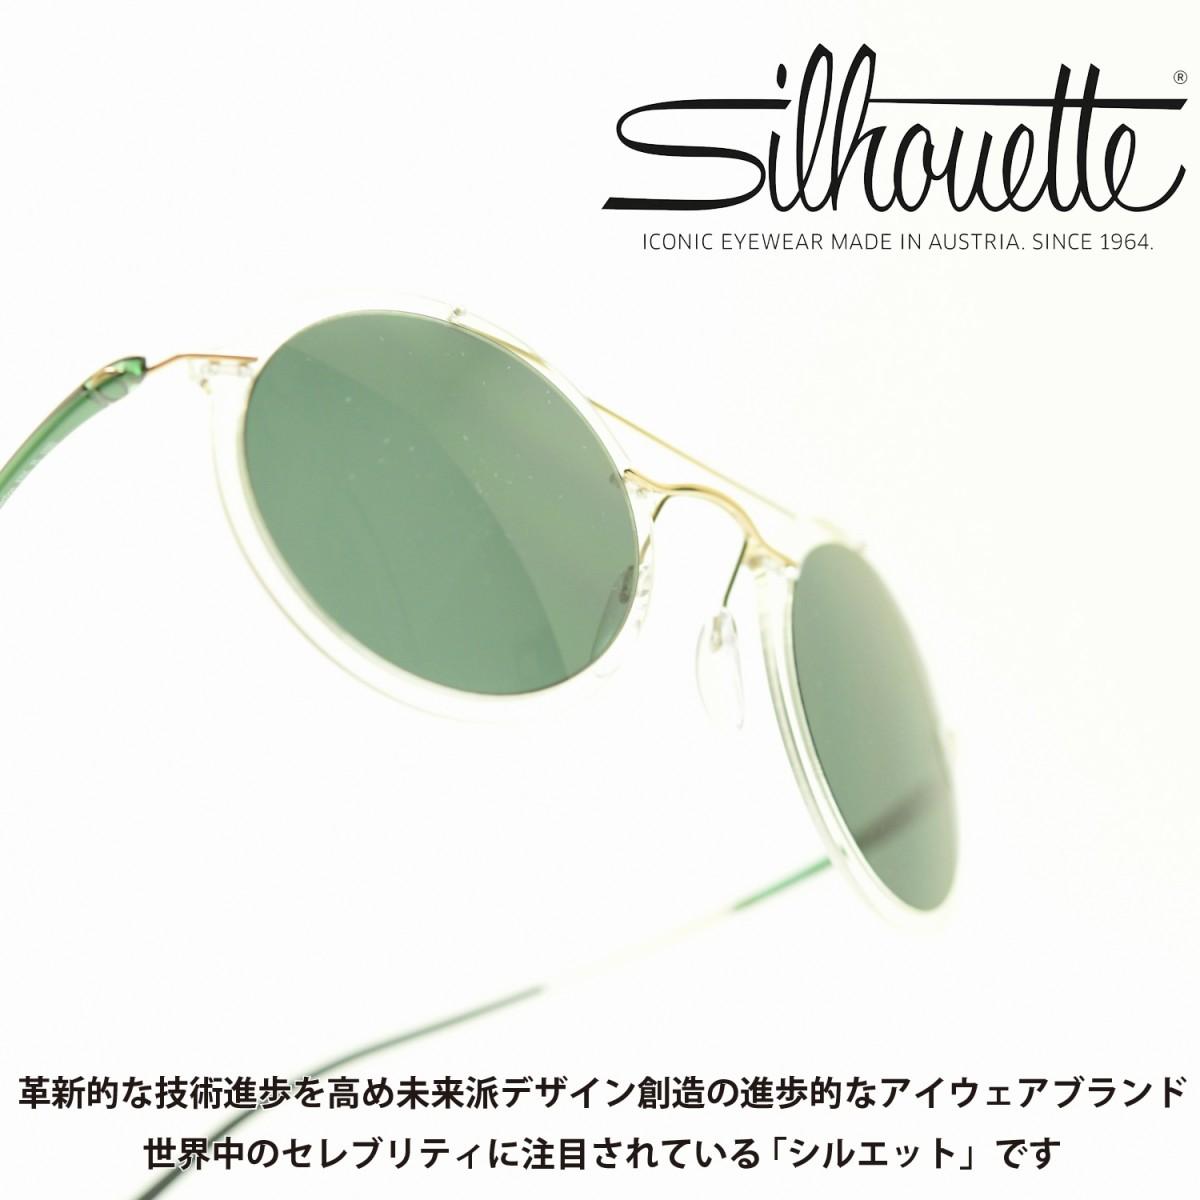 Silhouette シルエットInfinityコレクション 8705 75 1030